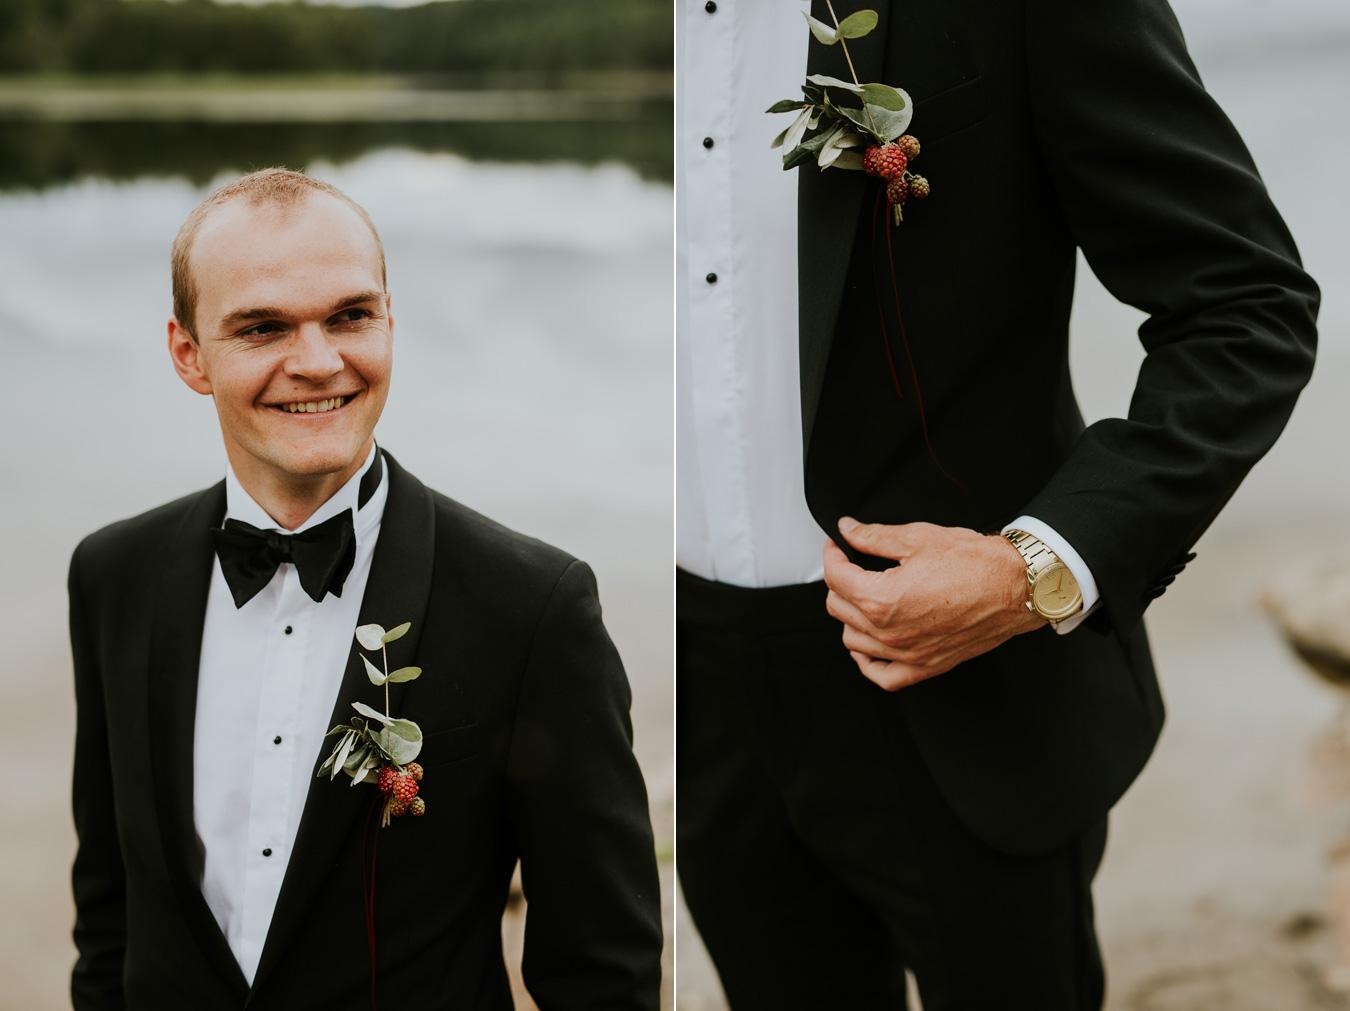 Bryllup-Lageret-Tofte-bryllupsfotograf-138.jpg